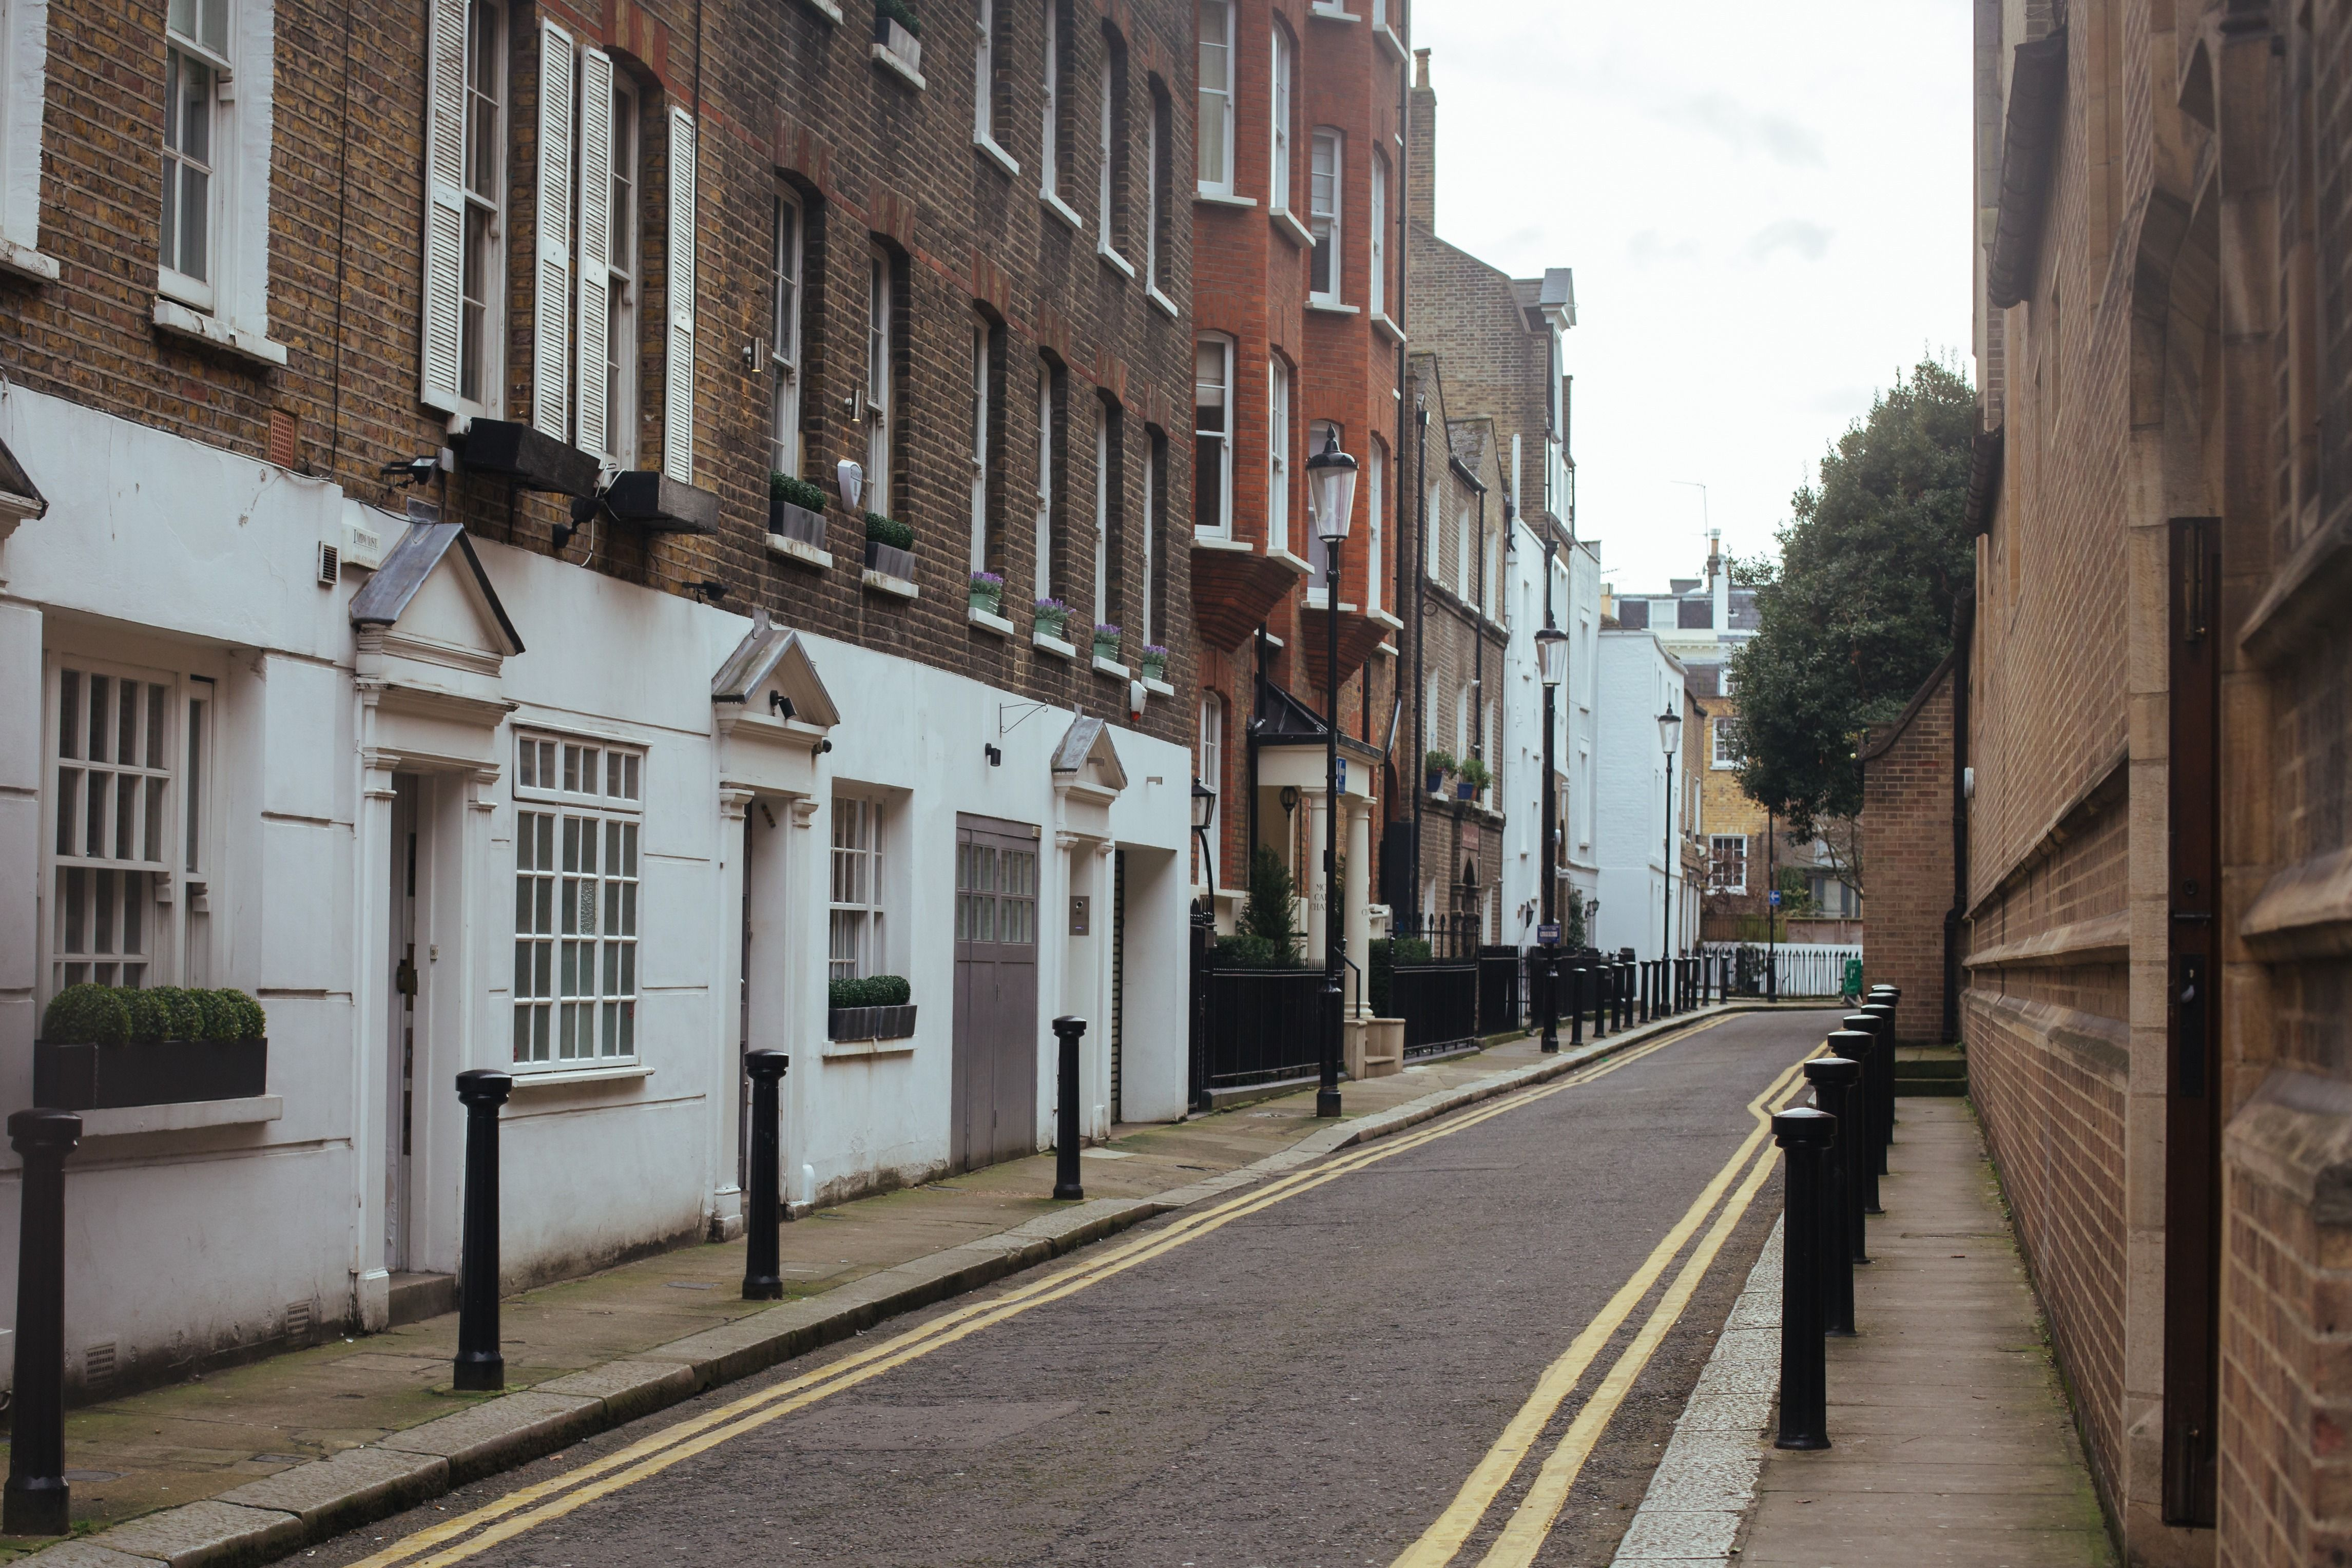 London Man Shoves Stroller, Calls Parents 'Dirty Jews' – The Forward